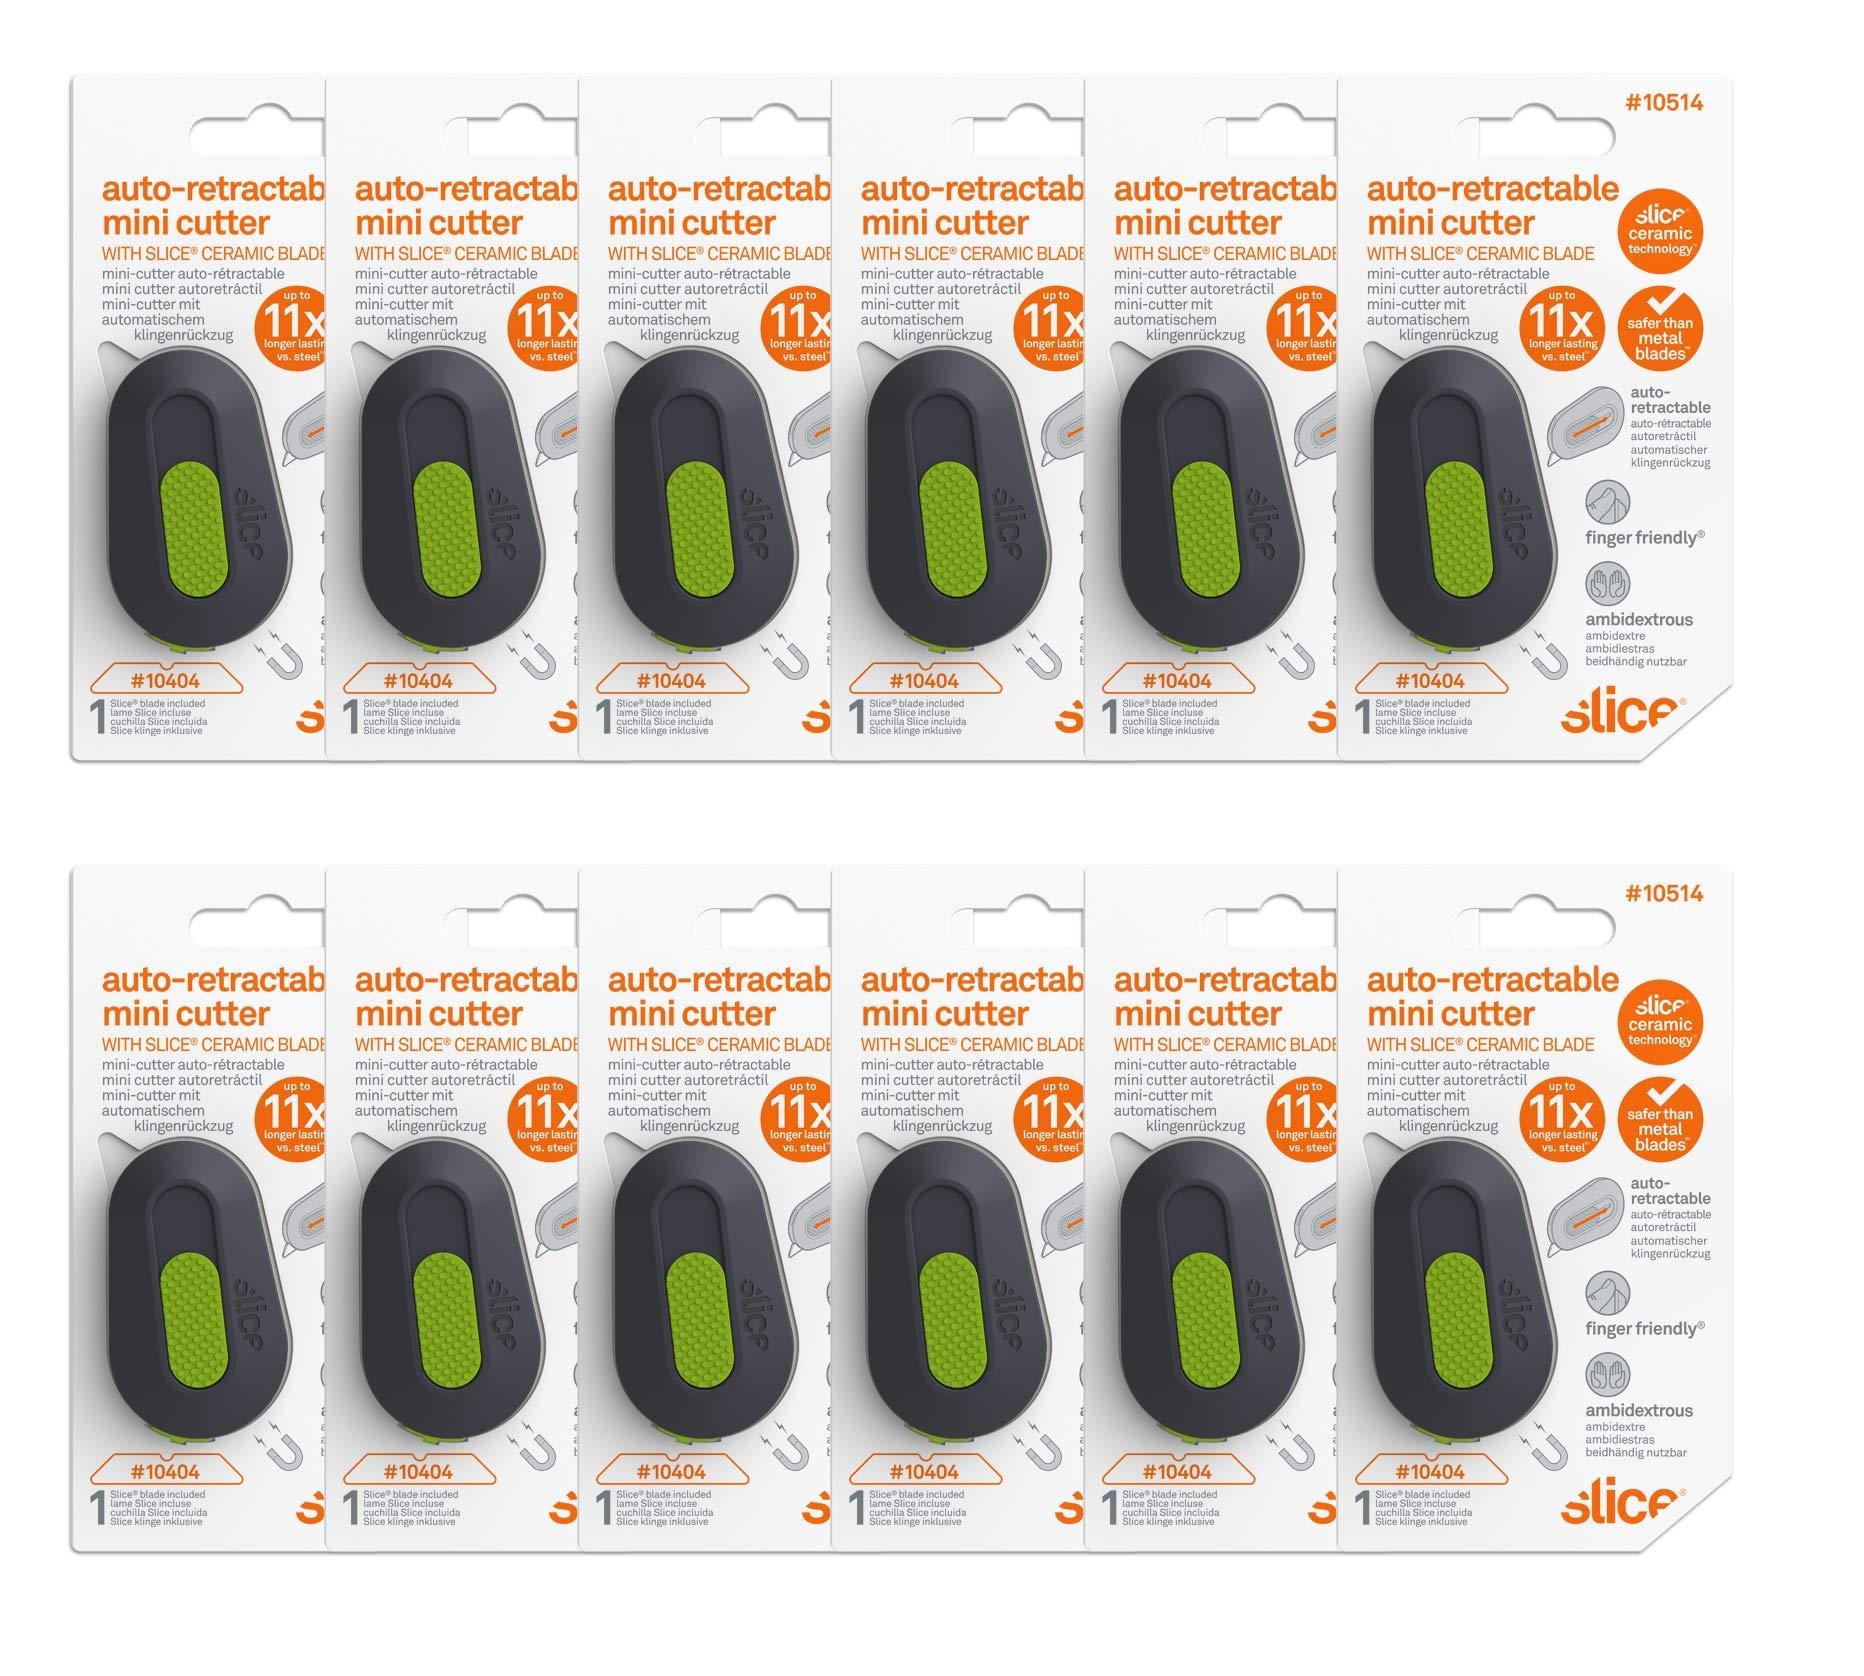 Slice 10514-CS Mini Cutter Auto-Retractable, Cuts Vinyl, Cardboard, Foam, Plastic Packaging Opener, Pack of 12 by Slice